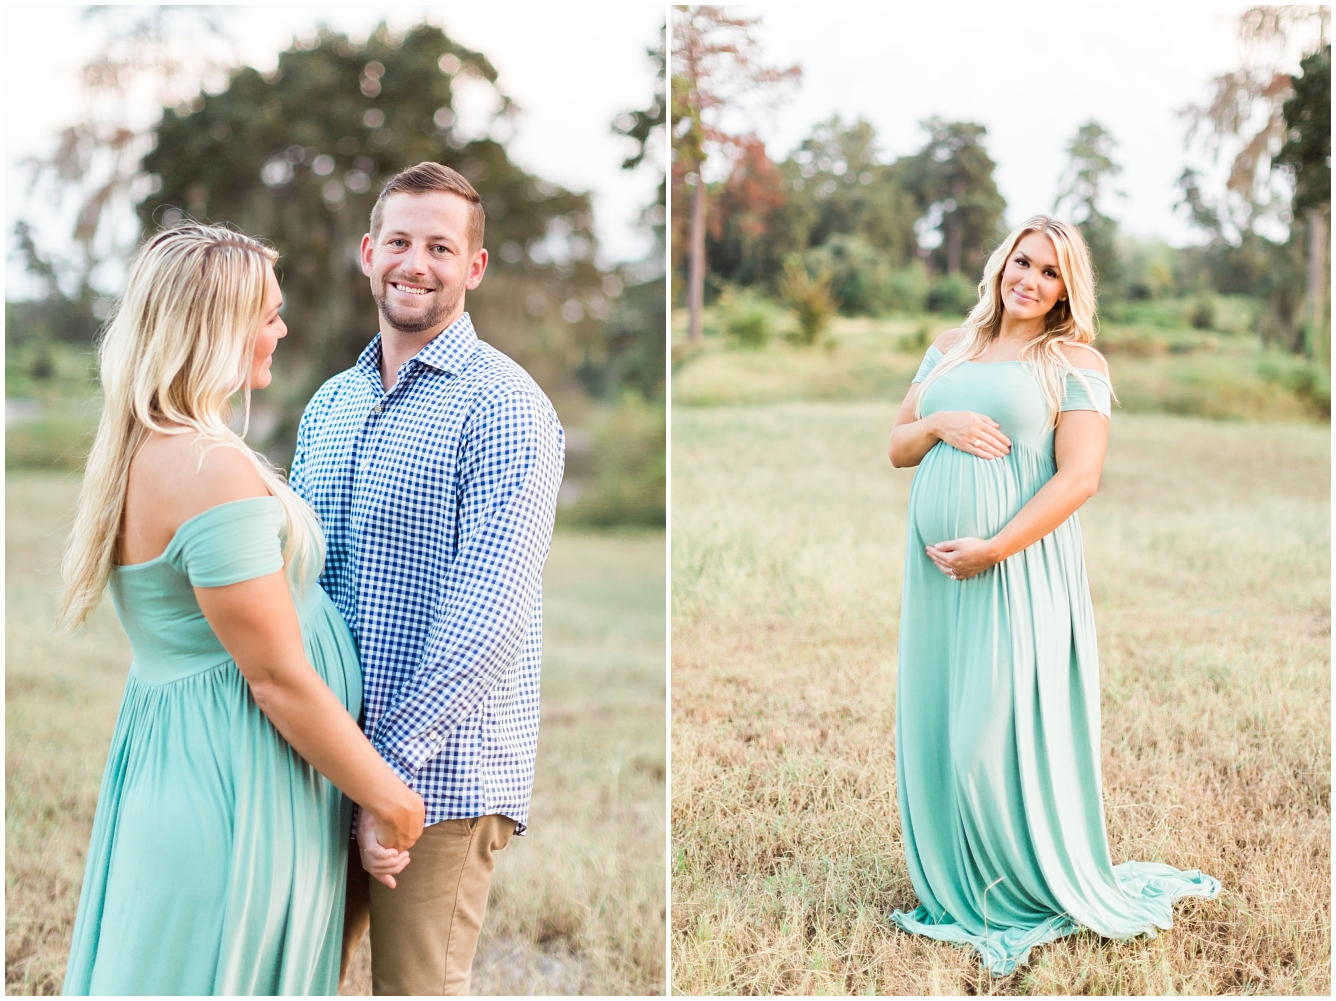 cypress-tx-maternity-photographer-16